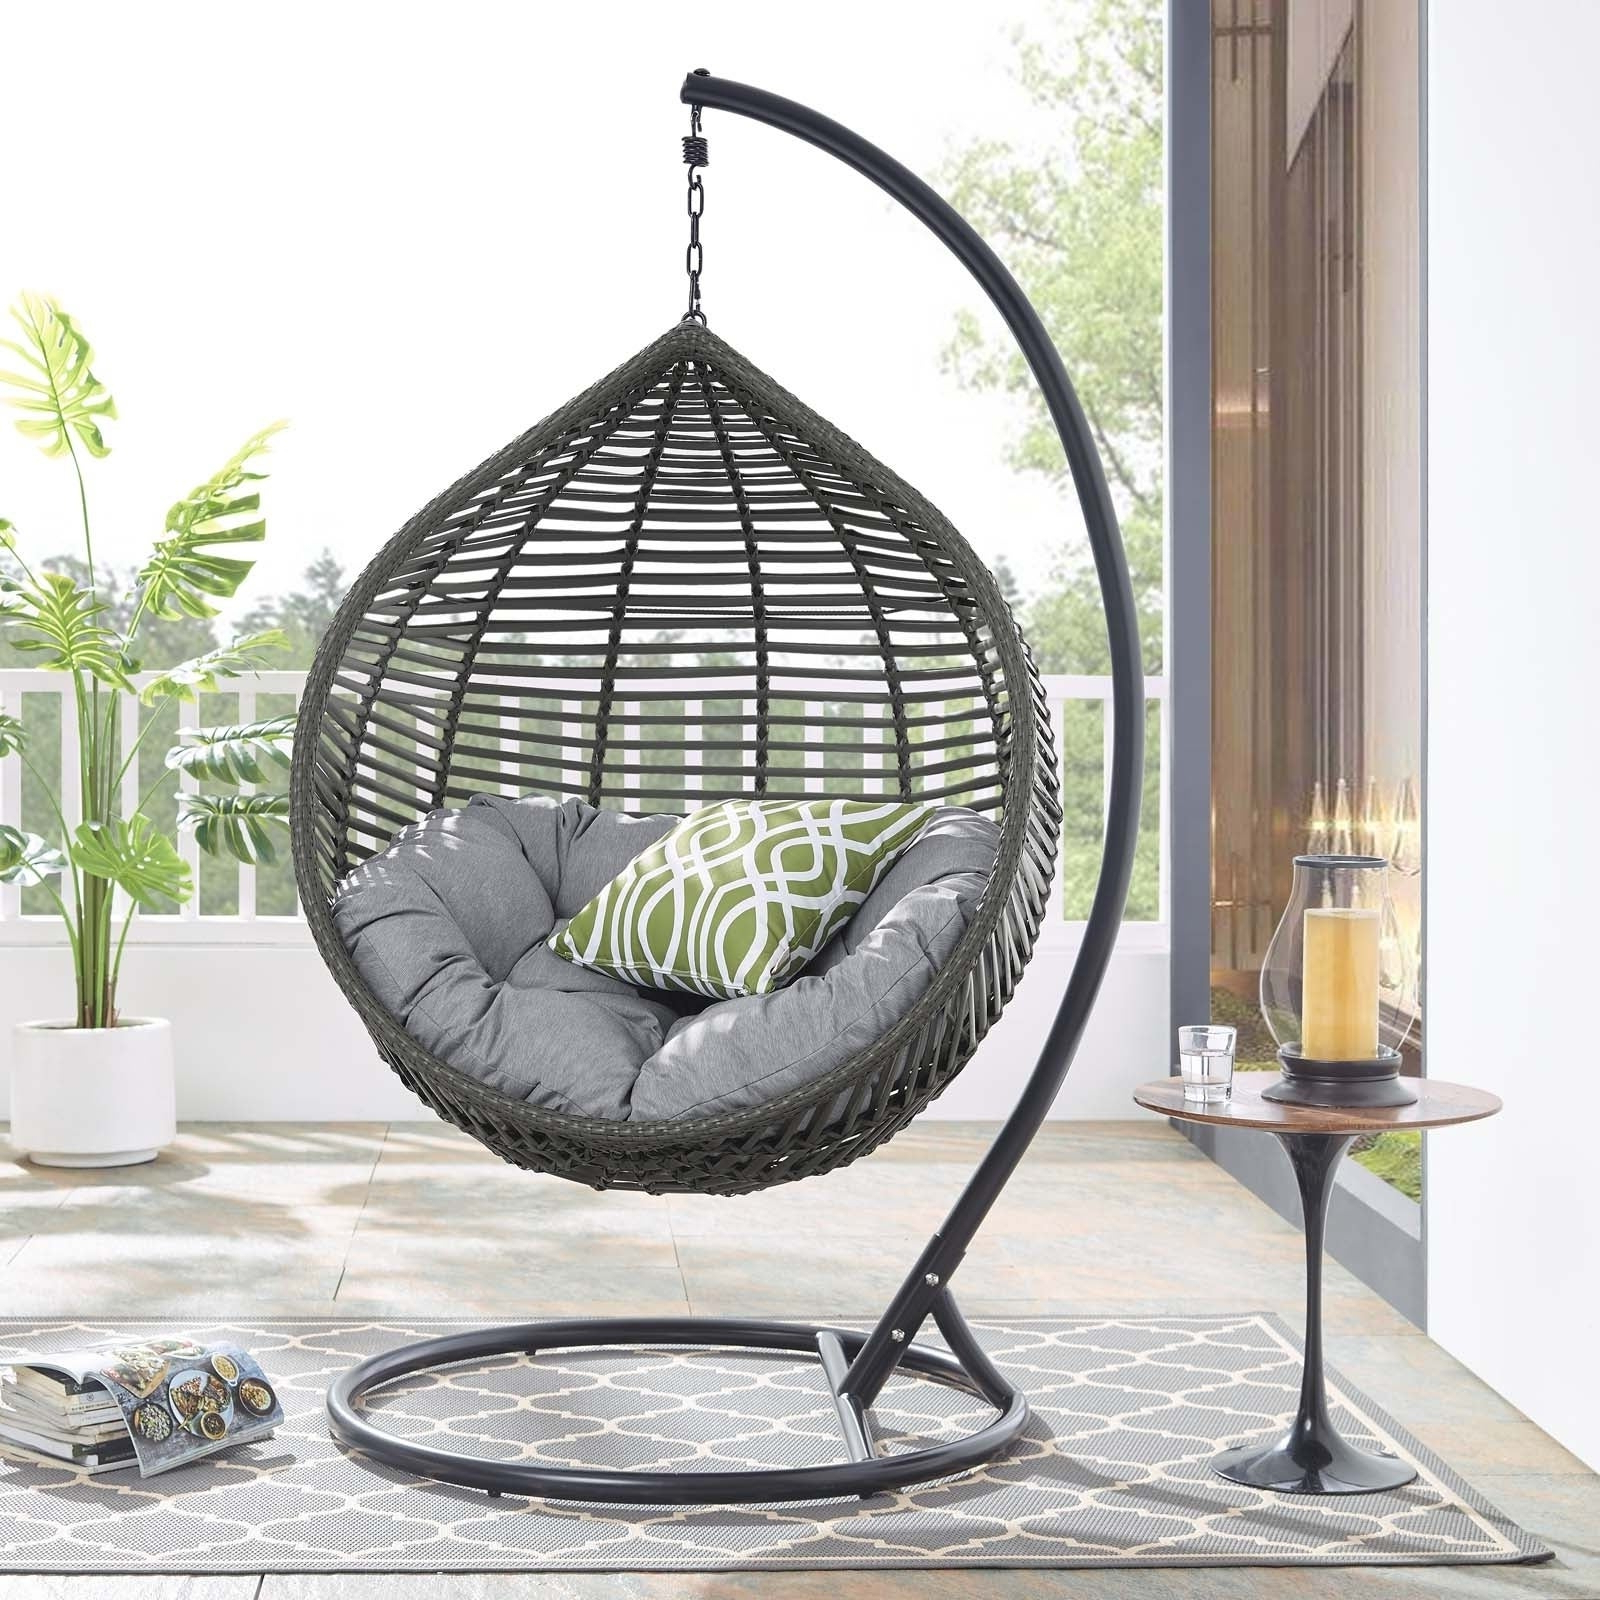 Garner Teardrop Outdoor Patio Swing Chair Regarding Well Known 2 Person Gray Steel Outdoor Swings (View 16 of 25)